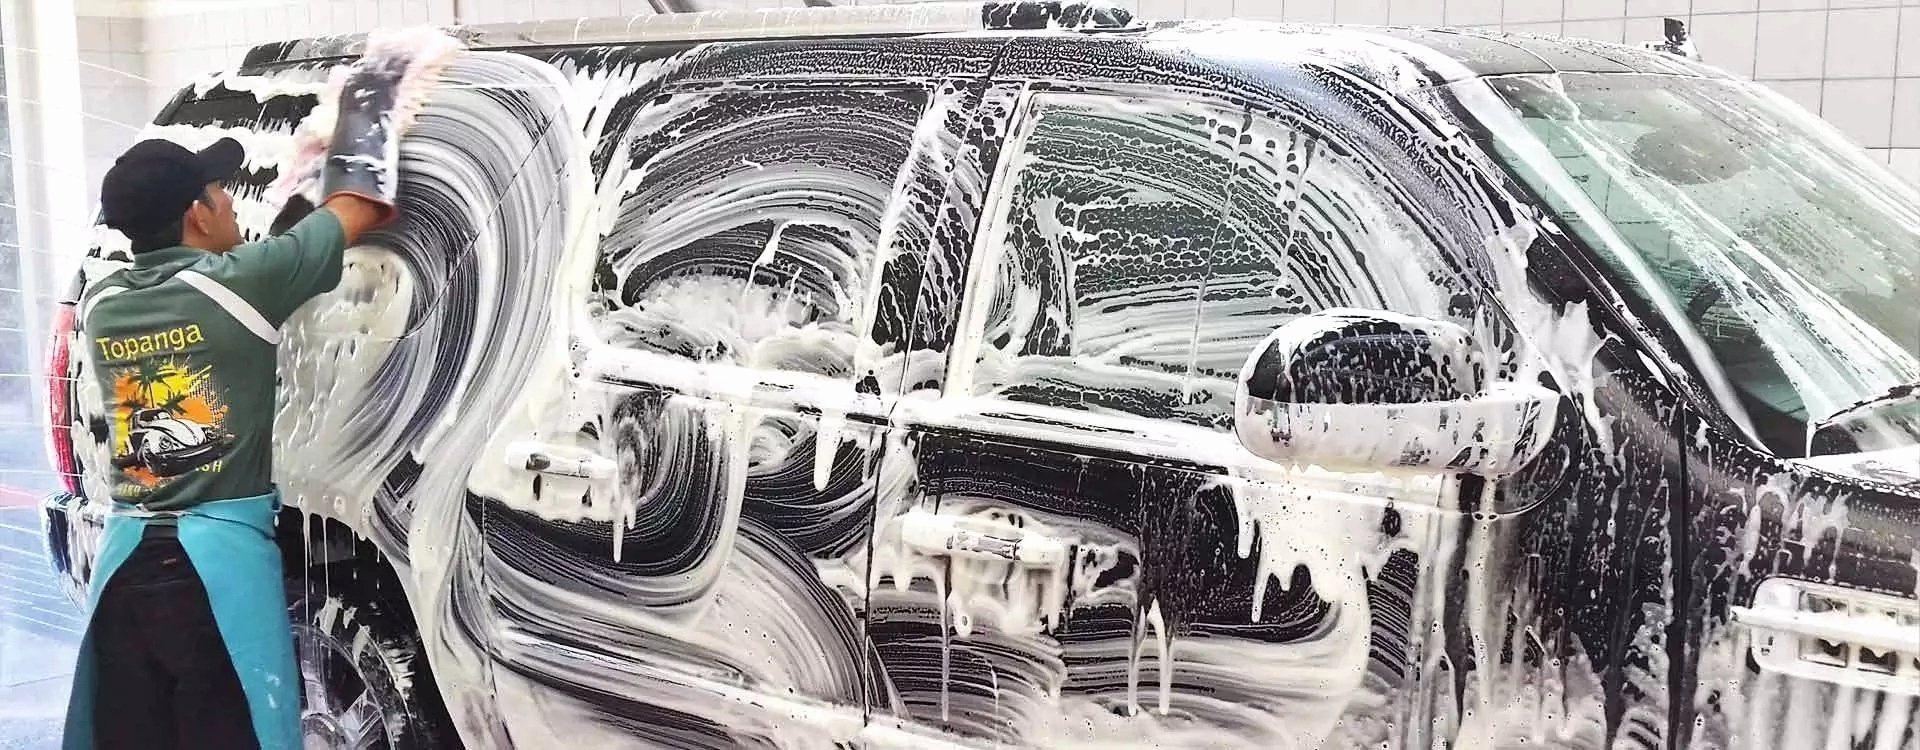 25 Car Wash Business Plan Pdf in 2020 Car wash business